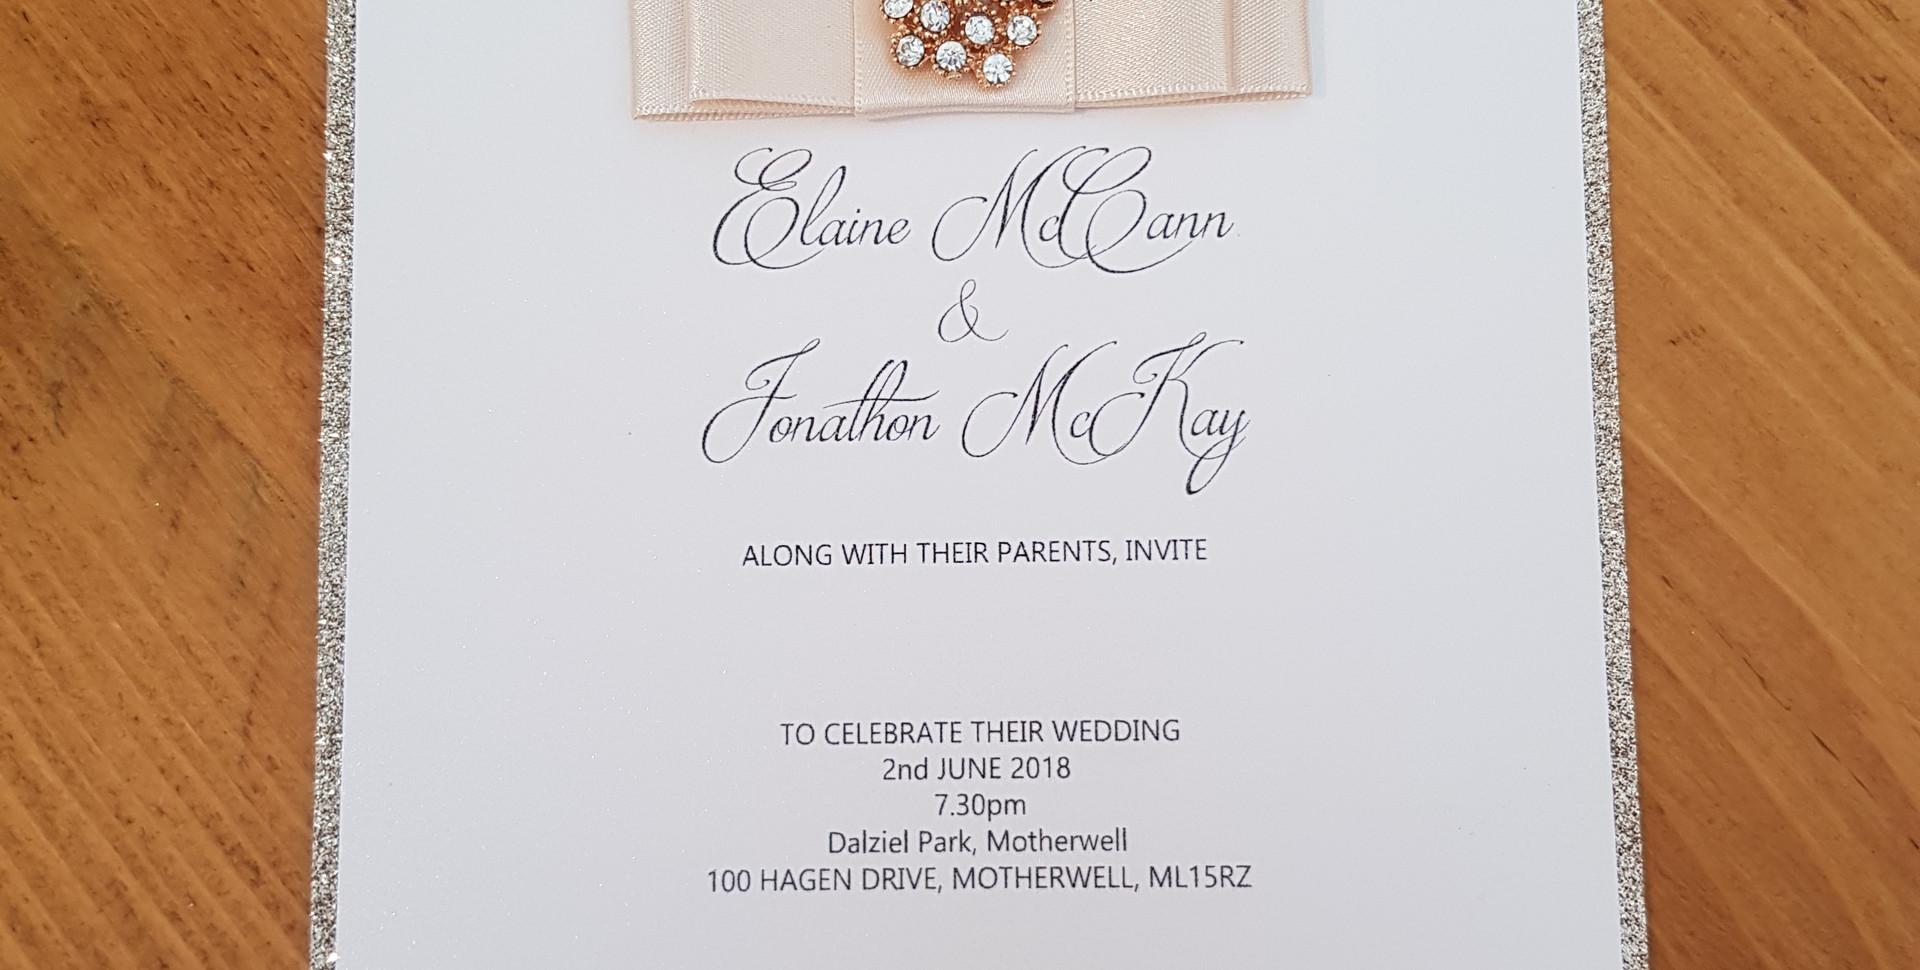 Elaine - Evening wedding invitation